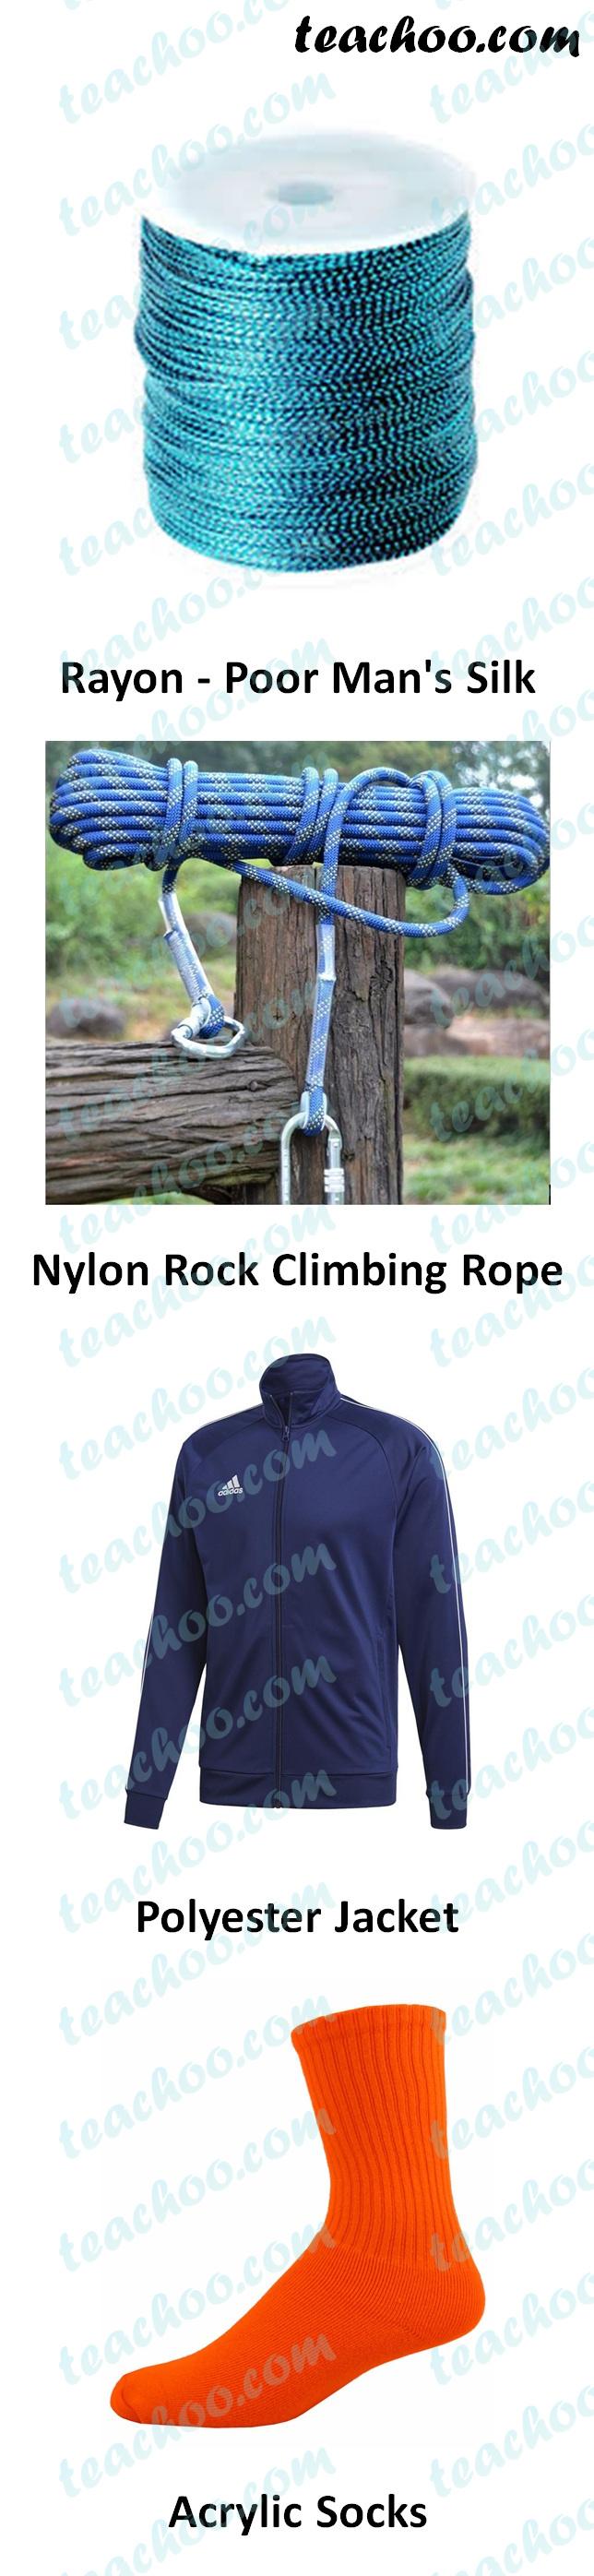 nylon---rayon---polyster---acrylic-merge.jpg